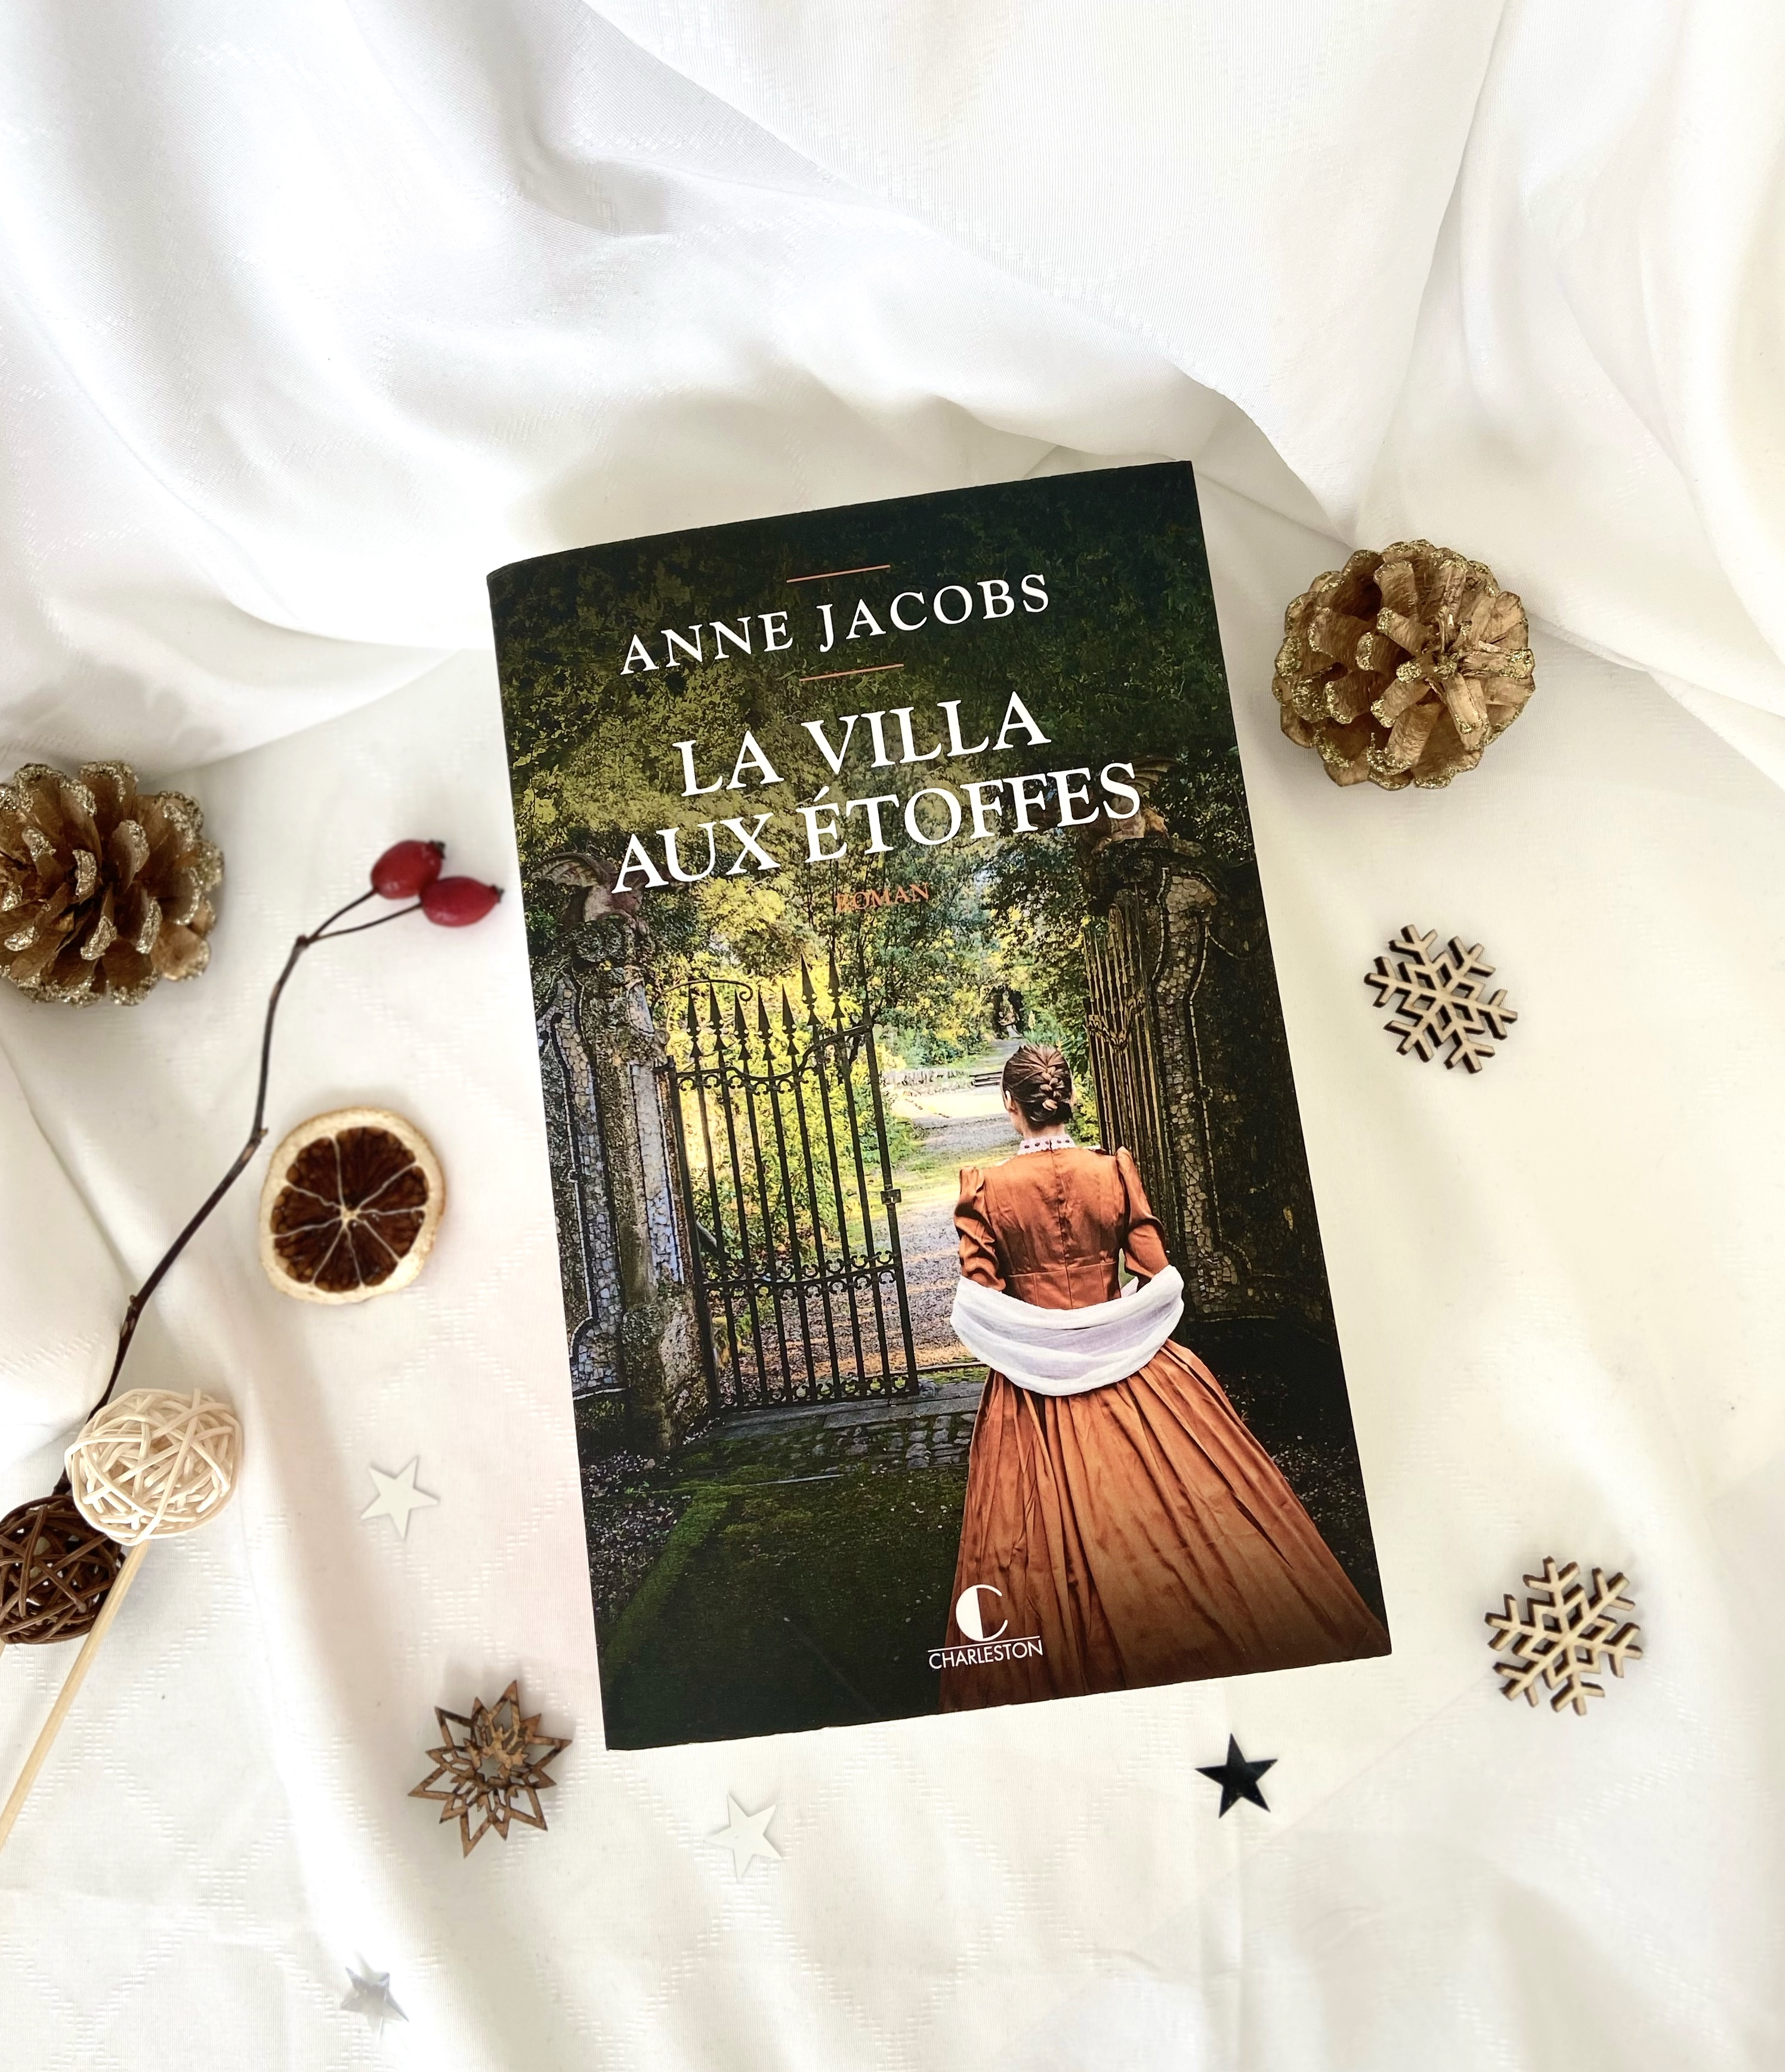 la-villa-aux-etoffes-anne-jacobs-editions-lilly-charleston-roman-saga-allemagne-